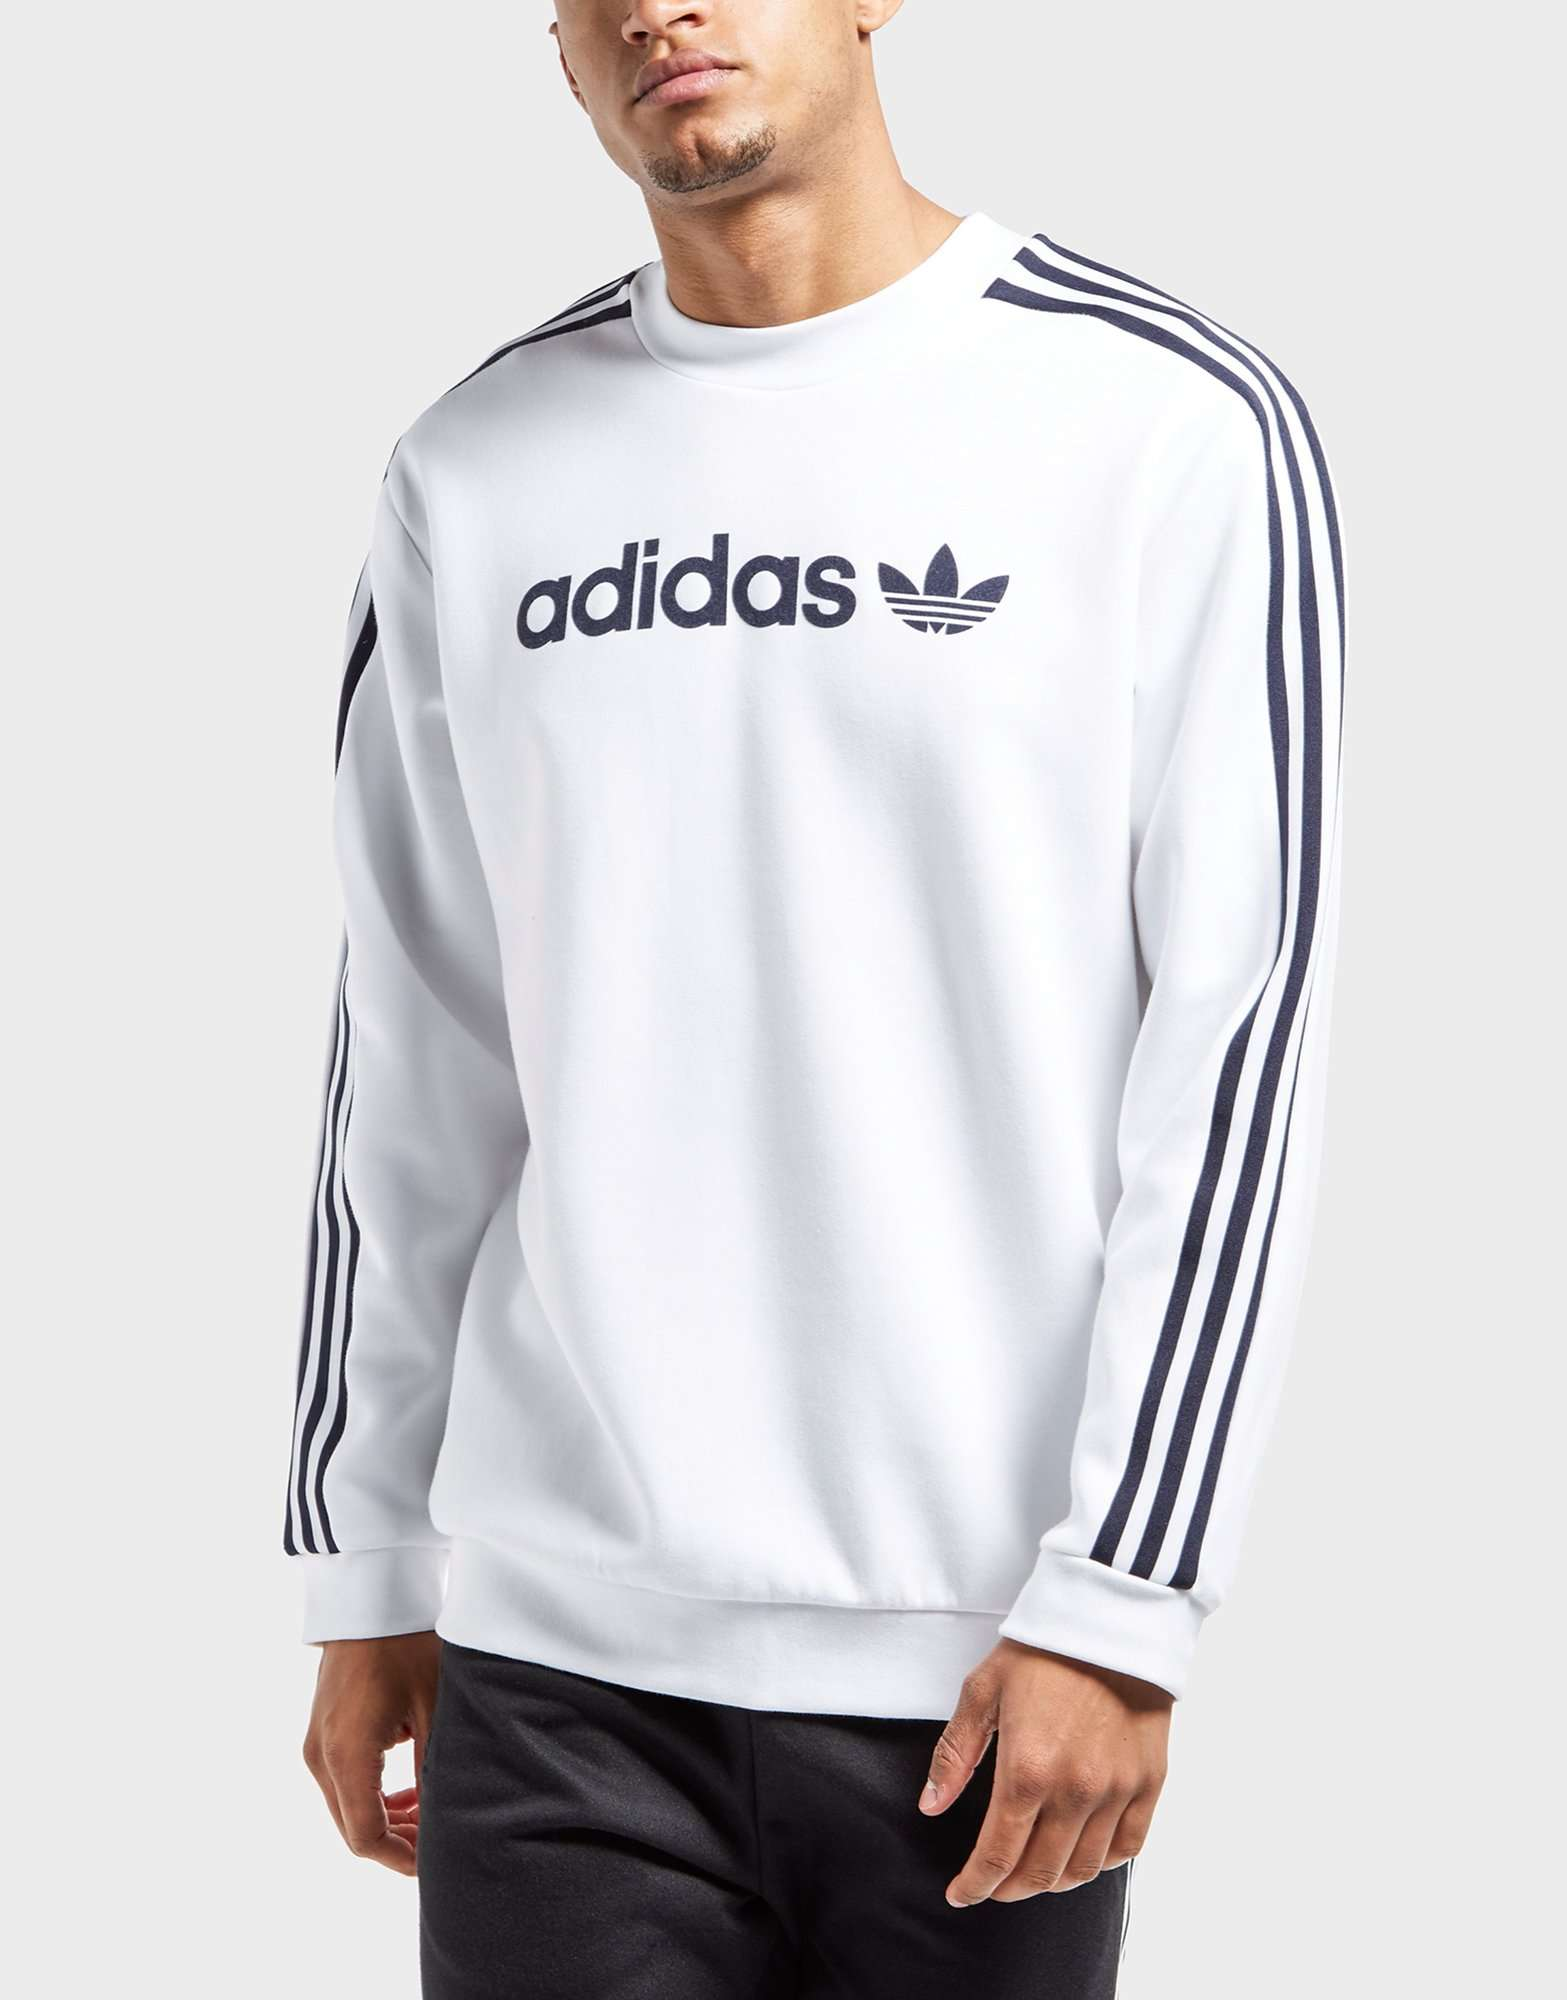 adidas linear trefoil sweatshirt